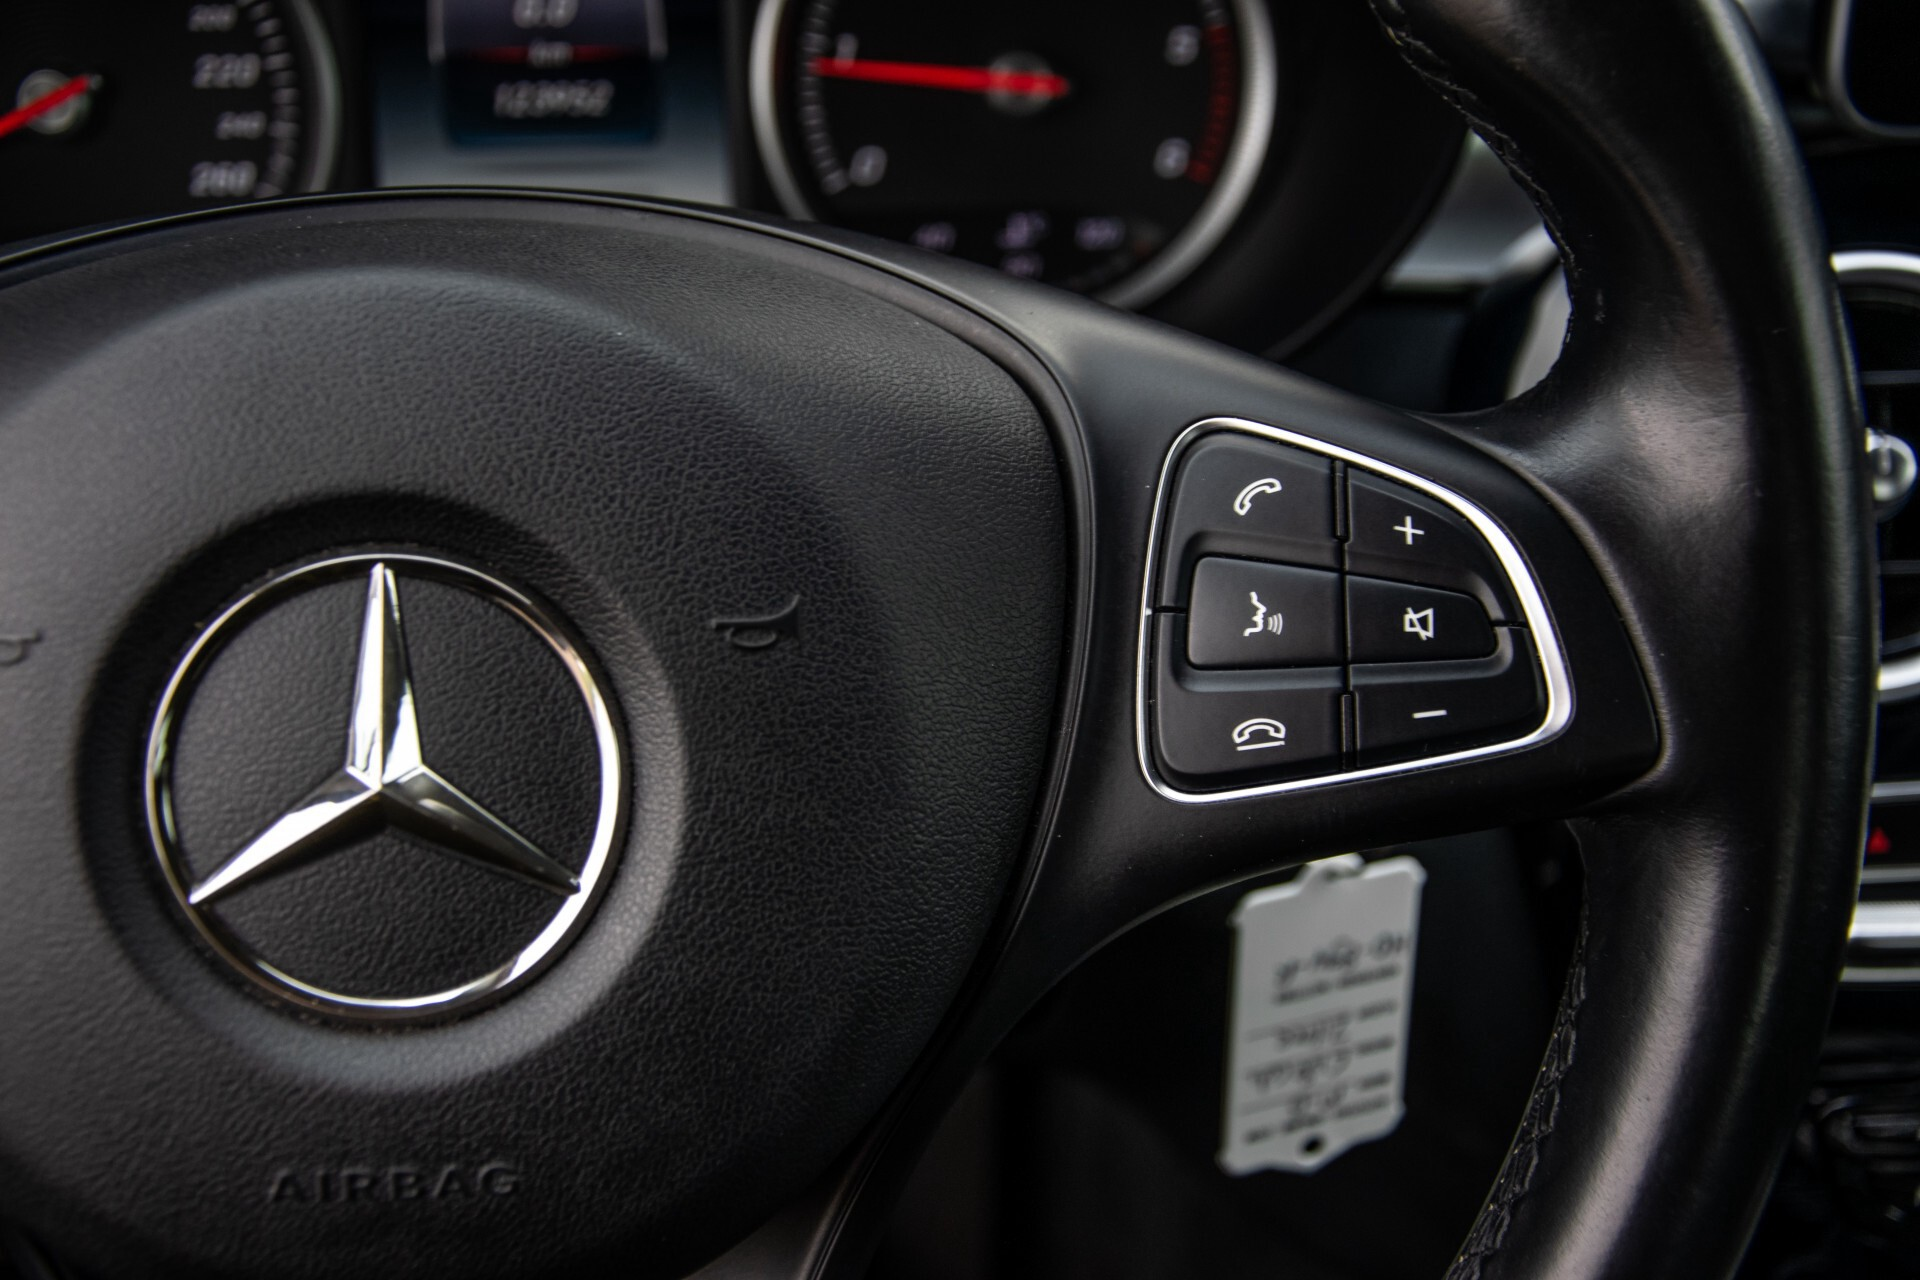 Mercedes-Benz C-Klasse 180 Bluetec Lease Edition Intelligent Light System/Cruise Control/Navi Foto 11